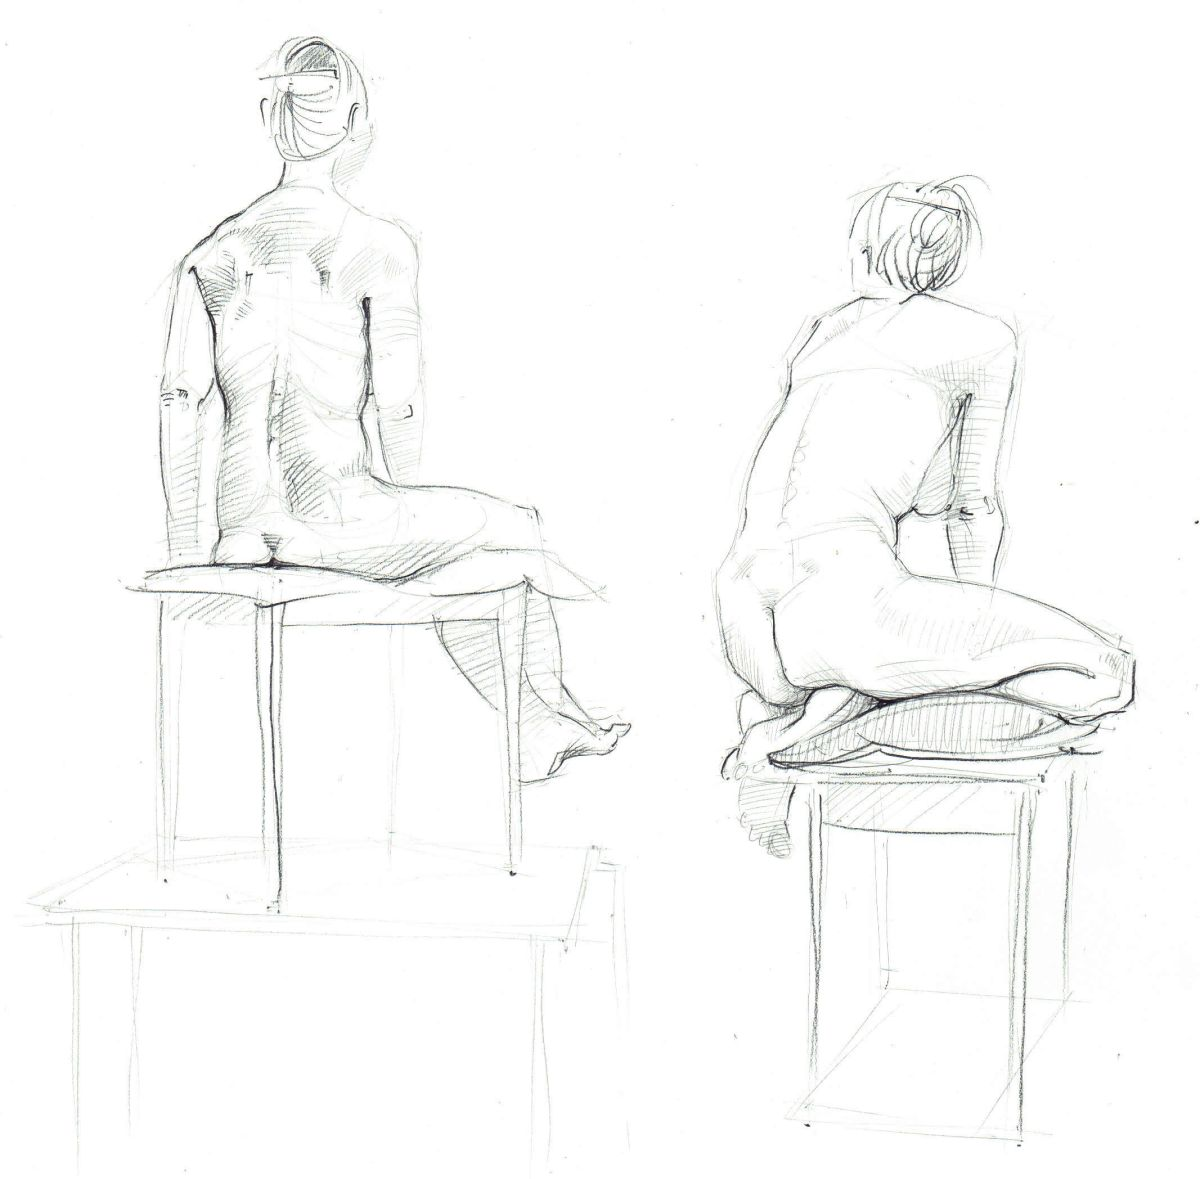 Life Drawing, pencil on paper, Nancy Farmer Jan 2019